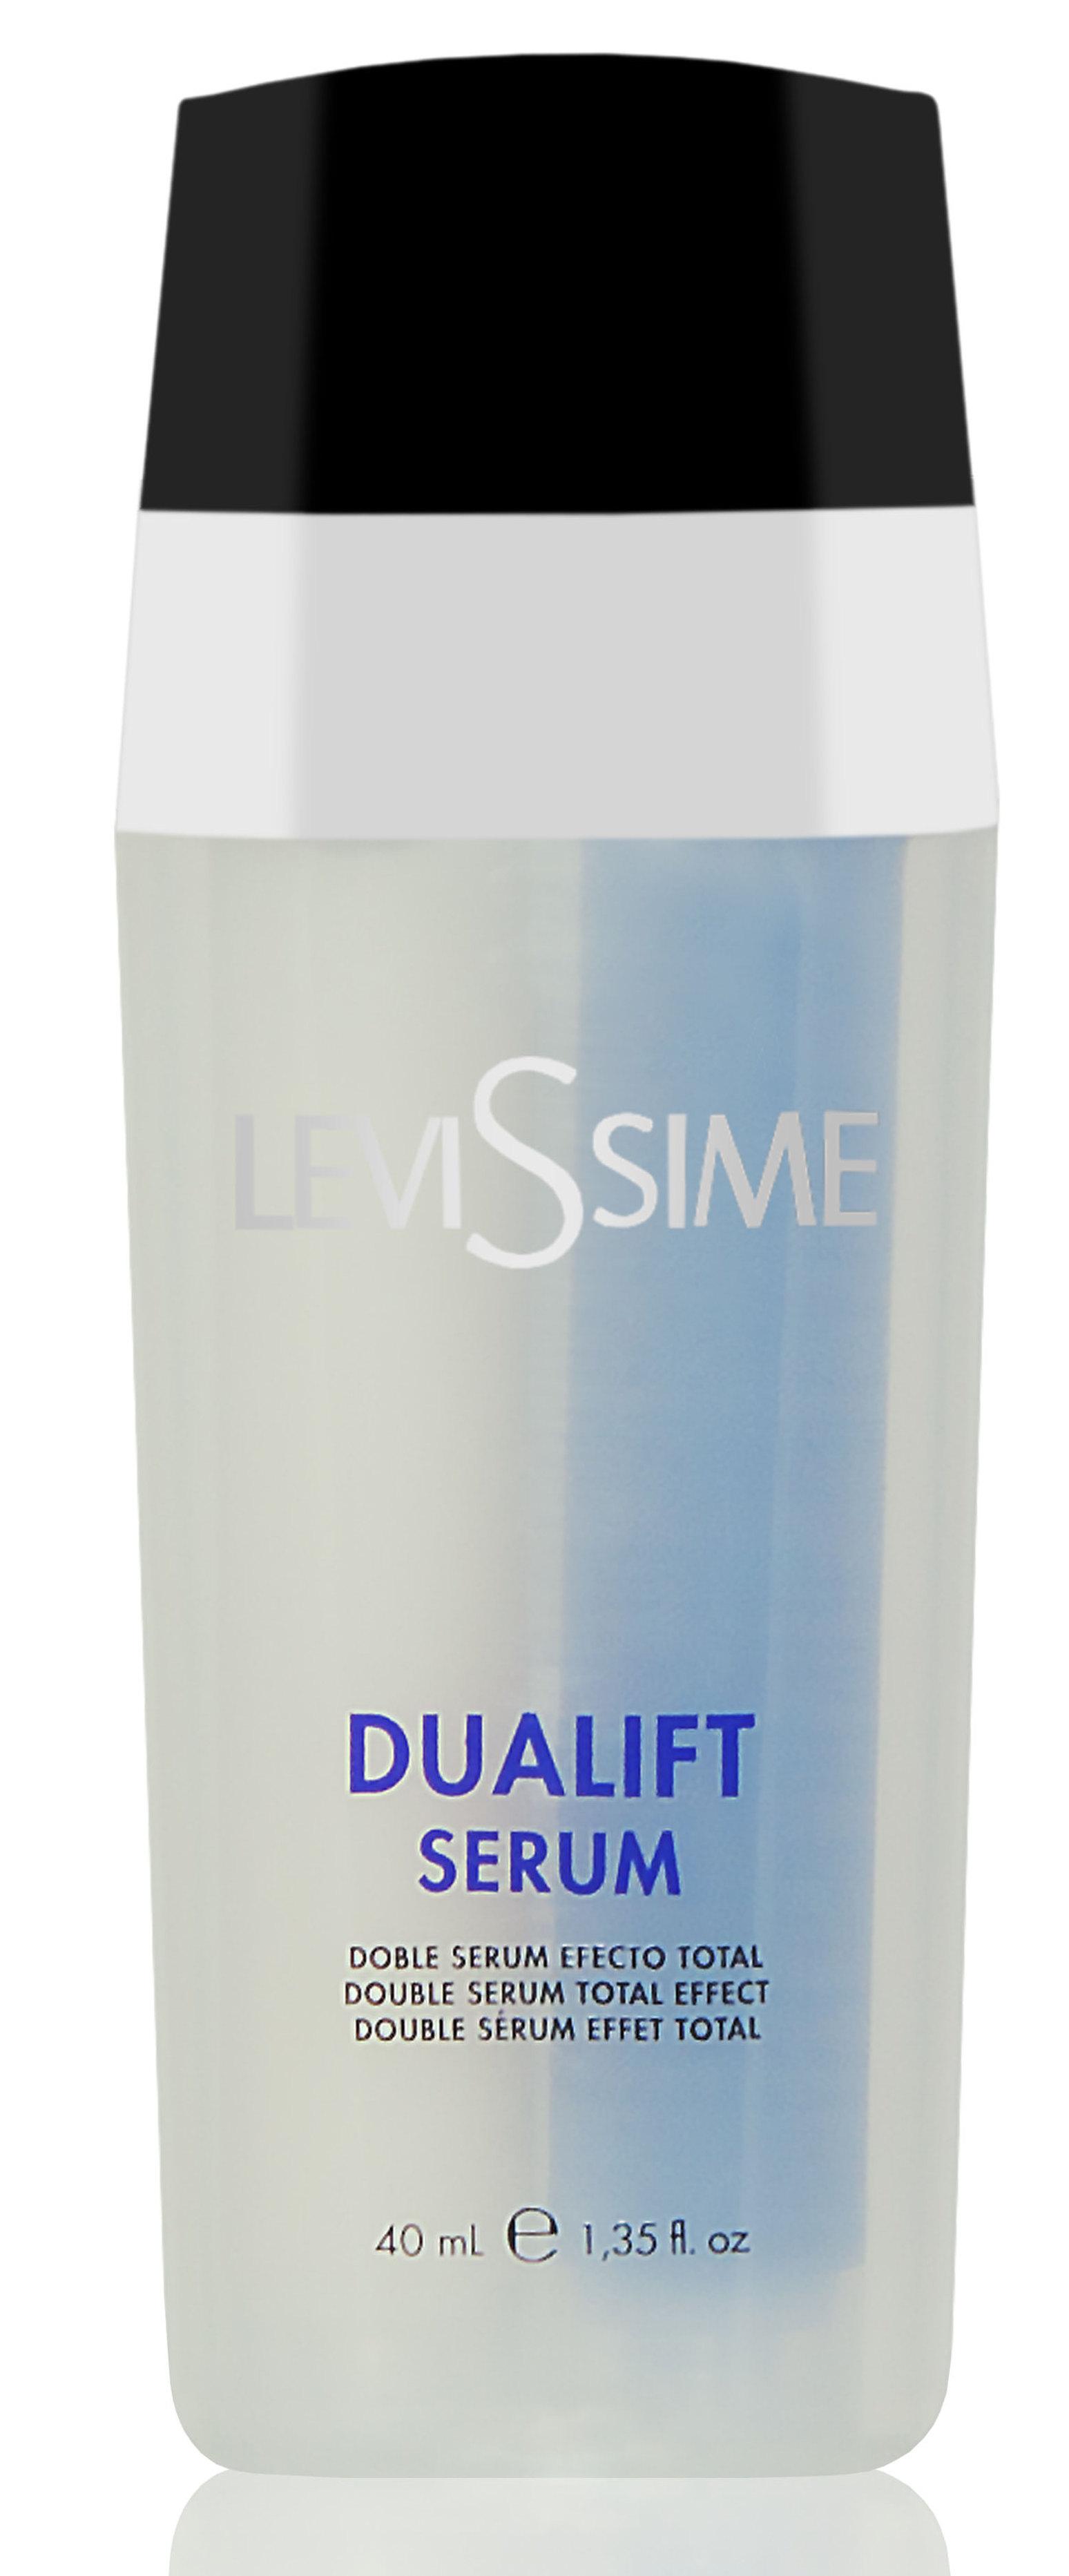 LEVISSIME Сыворотка омолаживающая двойного действия / Dualift Serum 40 мл